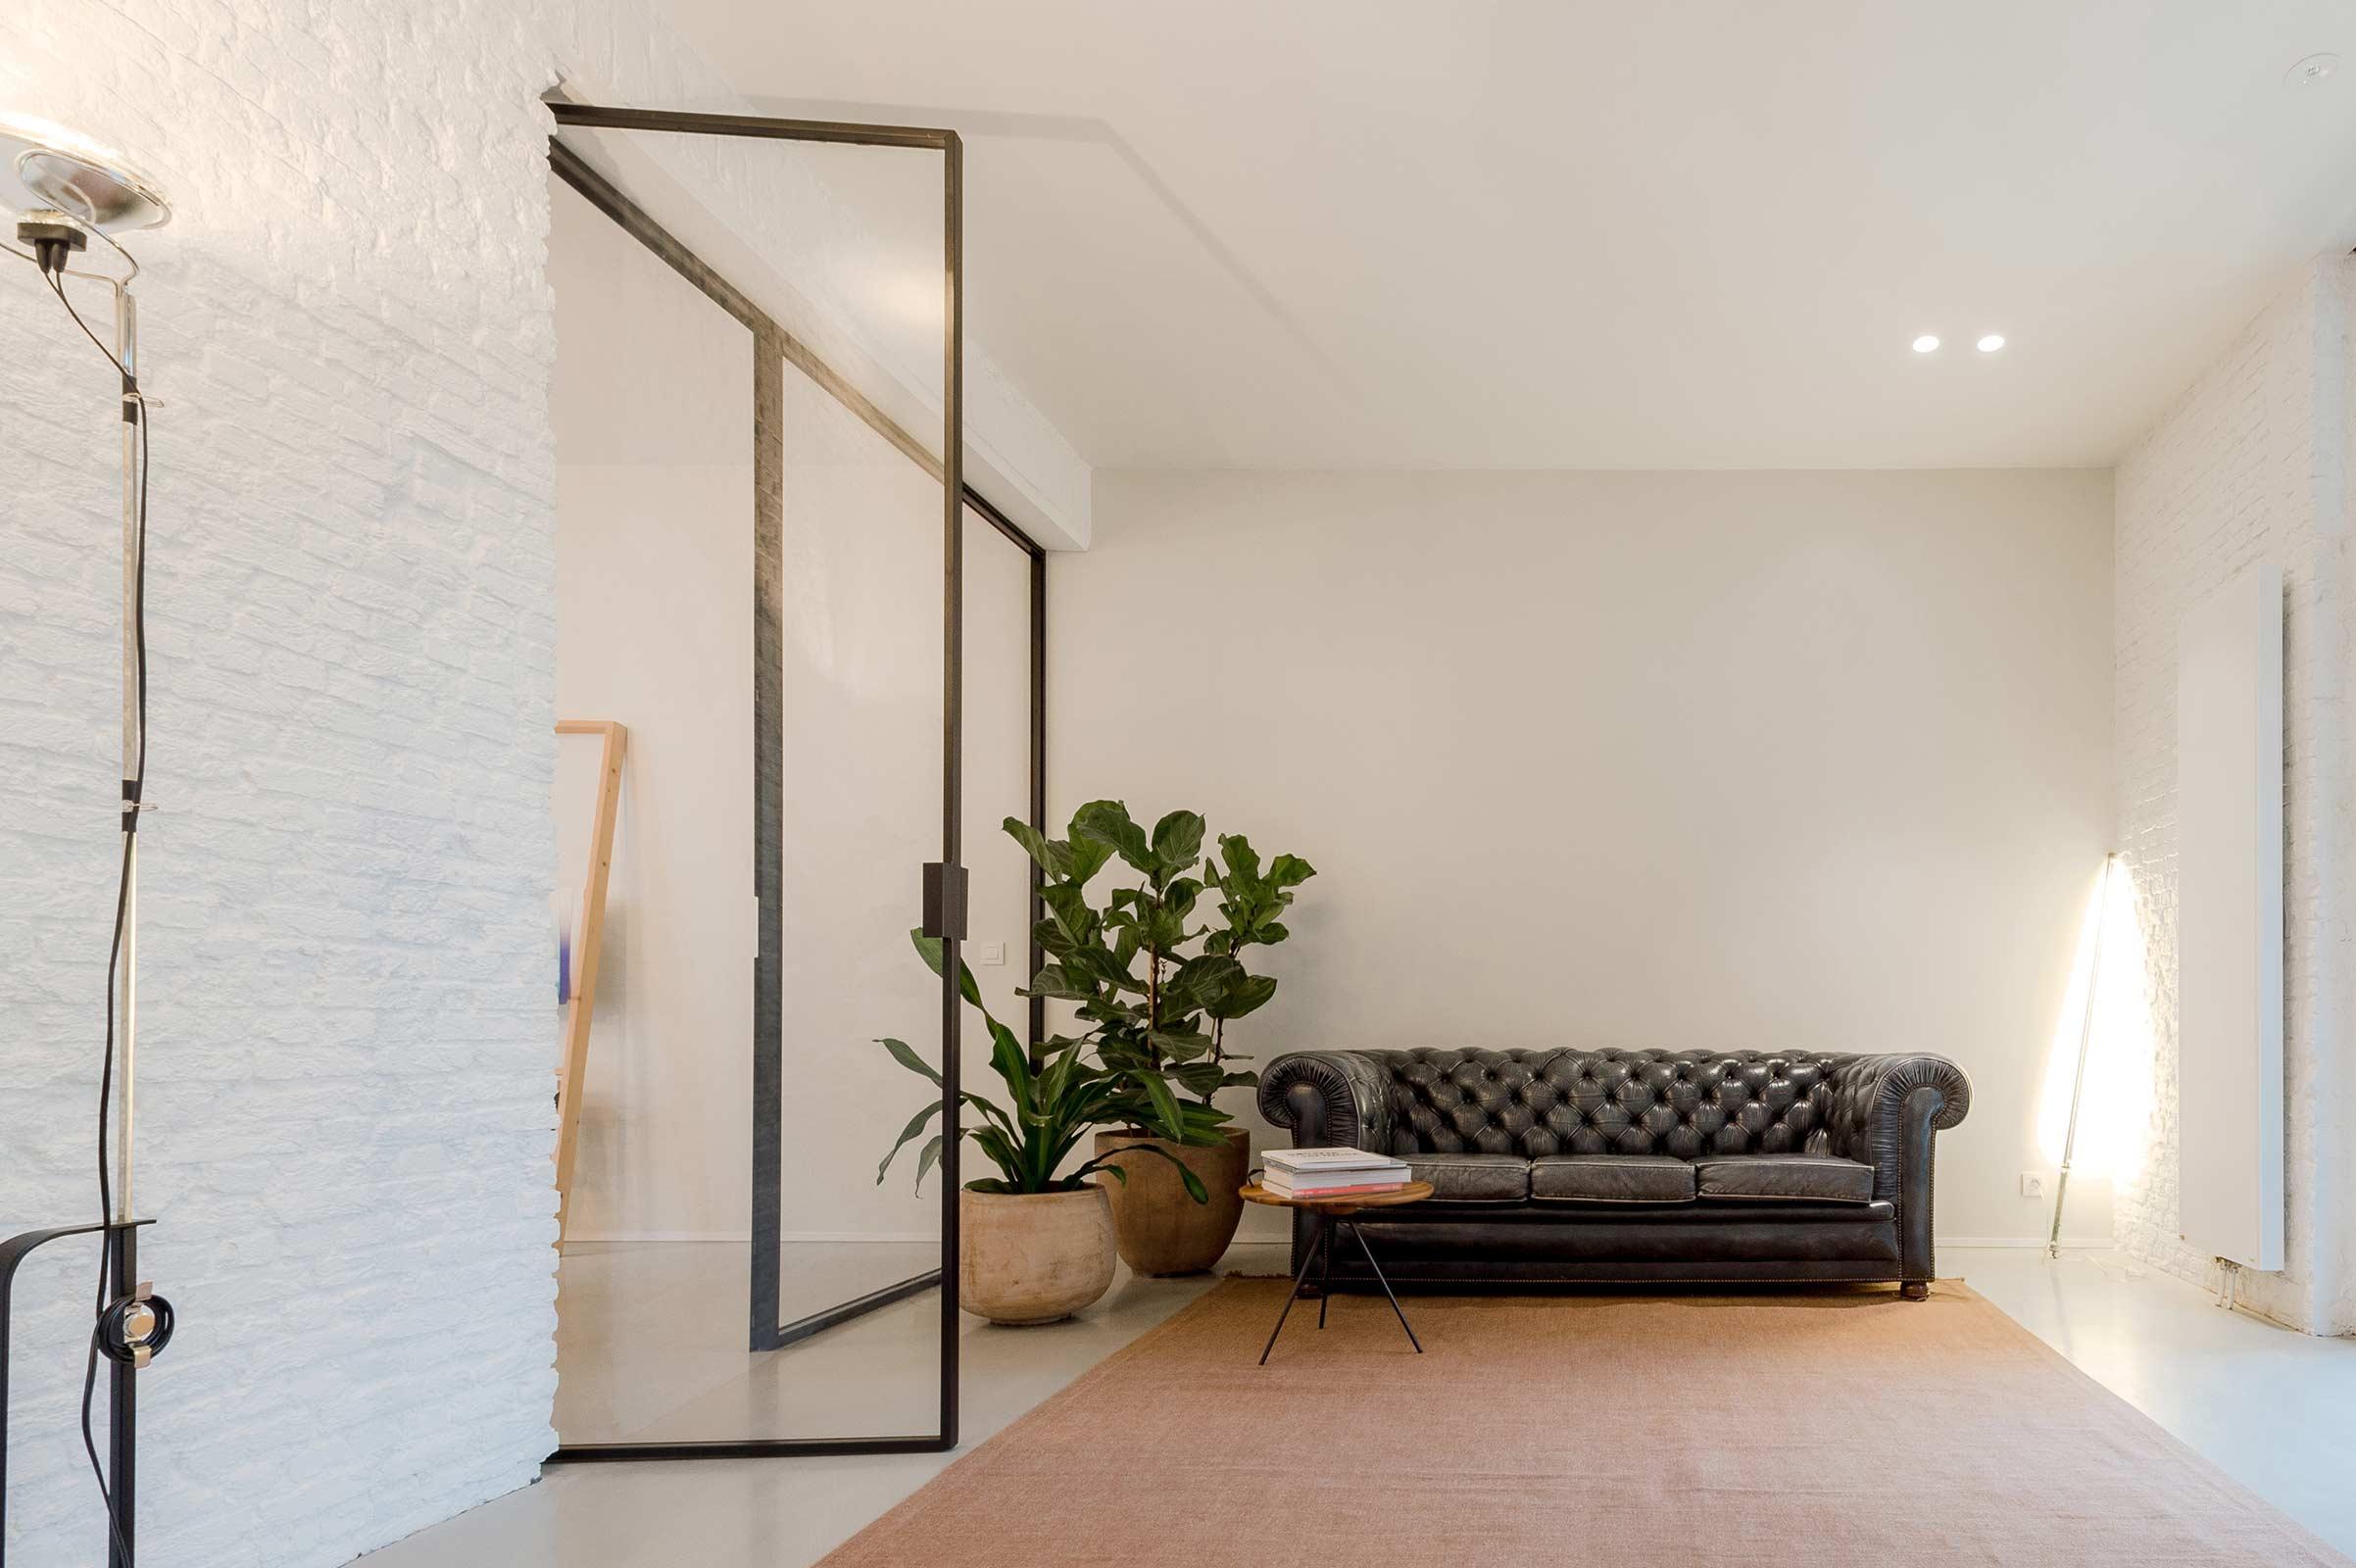 Studio Tolleneer - Office Antwerpen - Rijkswachtkazerne - Kerakoll wall muur - Chesterfield couch zetel